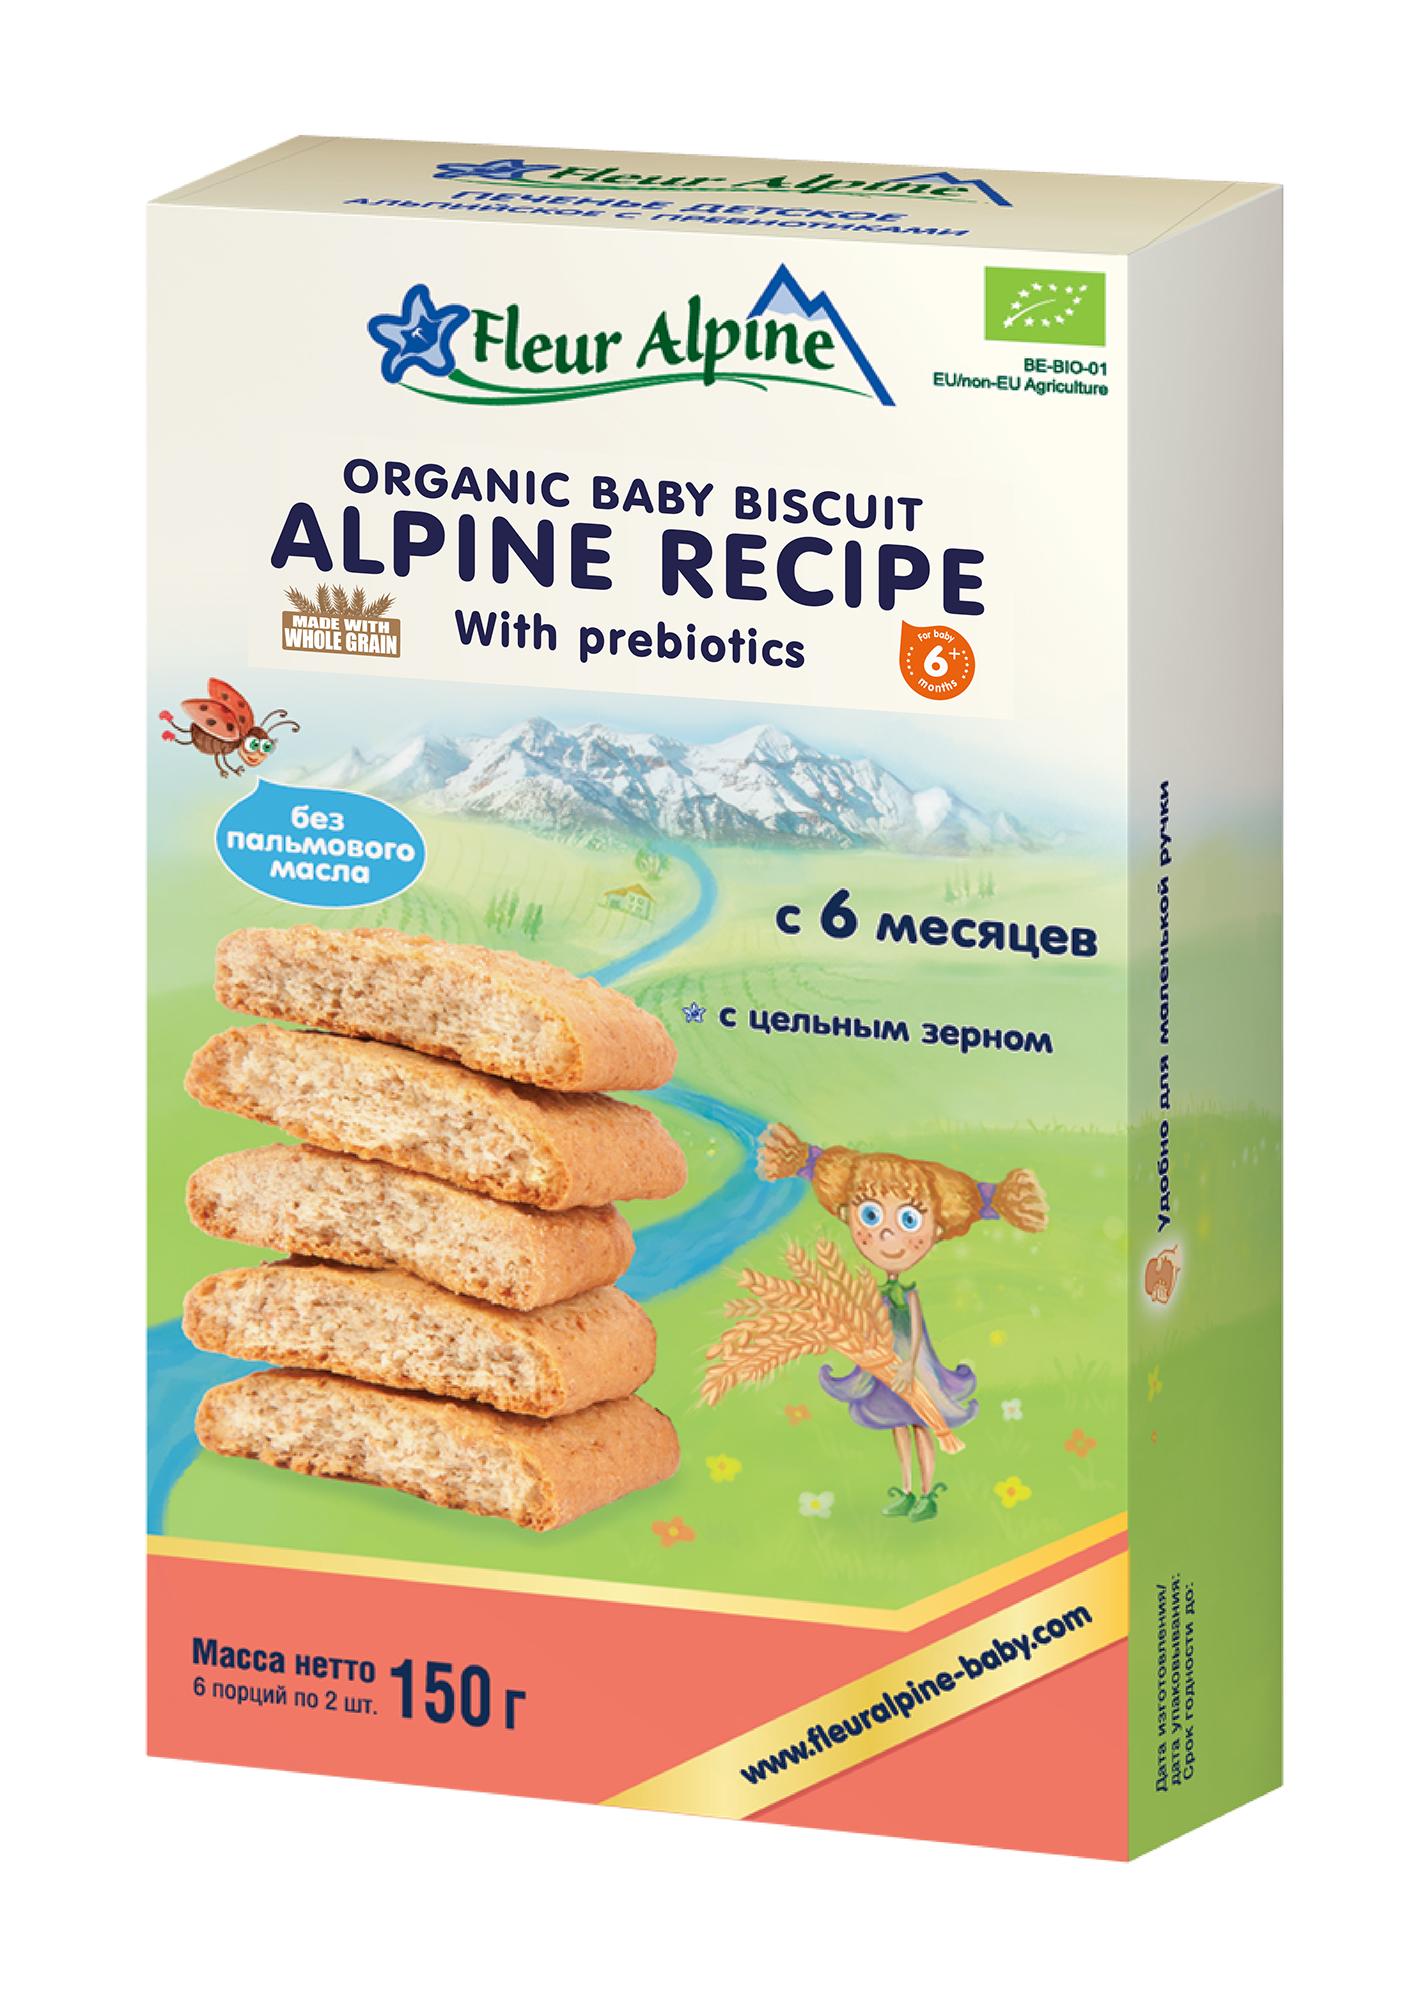 Thực phẩm bổ sung bánh ăn dặm Organic Alpine Prebiotic 150g